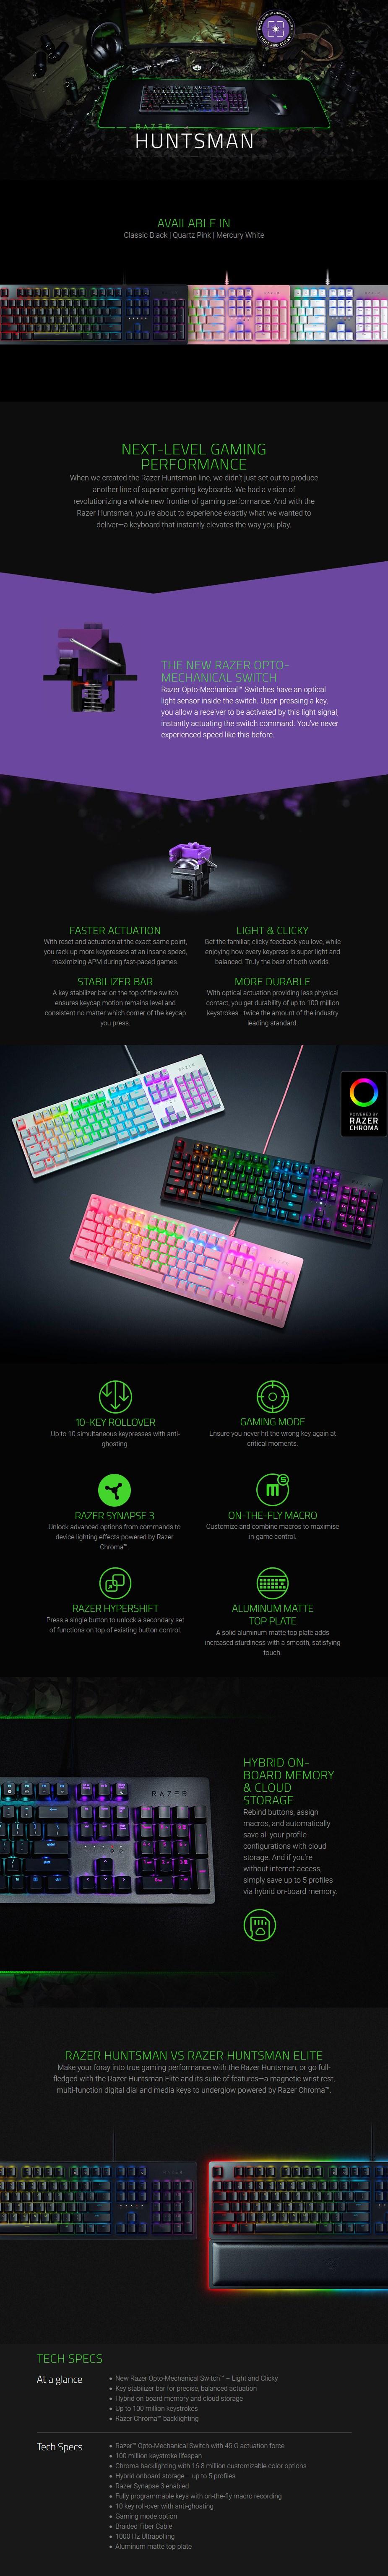 Razer Huntsman Opto-Mechanical Gaming Keyboard - Quartz - Overview 1